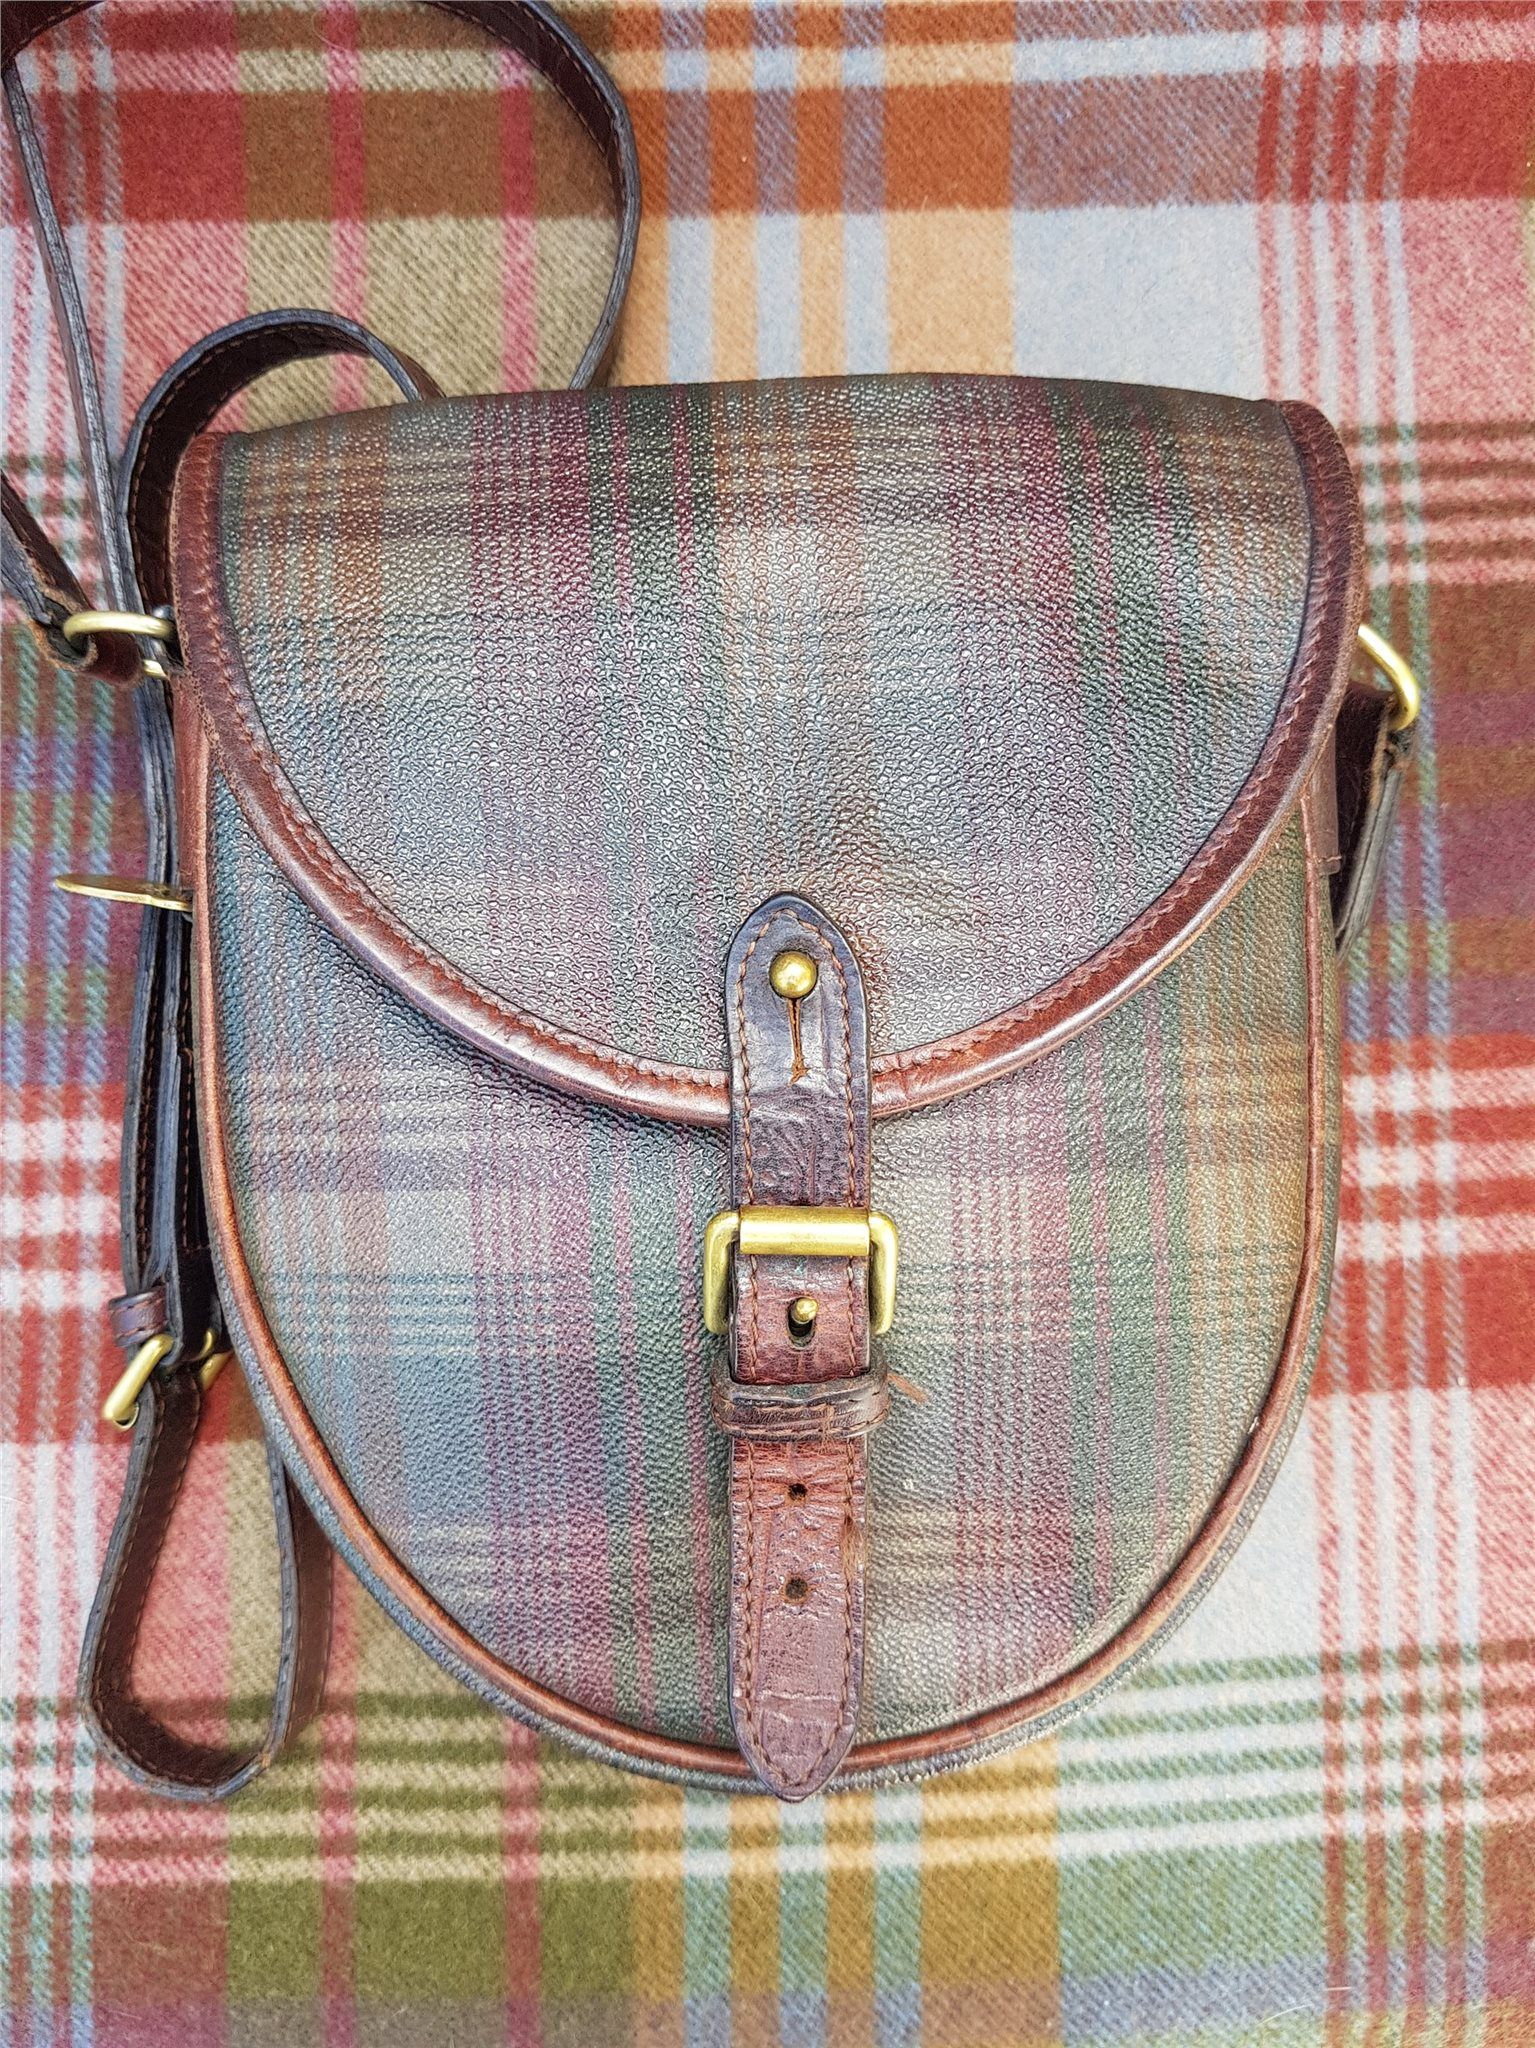 e1c59fd3477d4 Mulberry Vintage Saddle bag. Tartan check Scotchgrain nile Leather ...